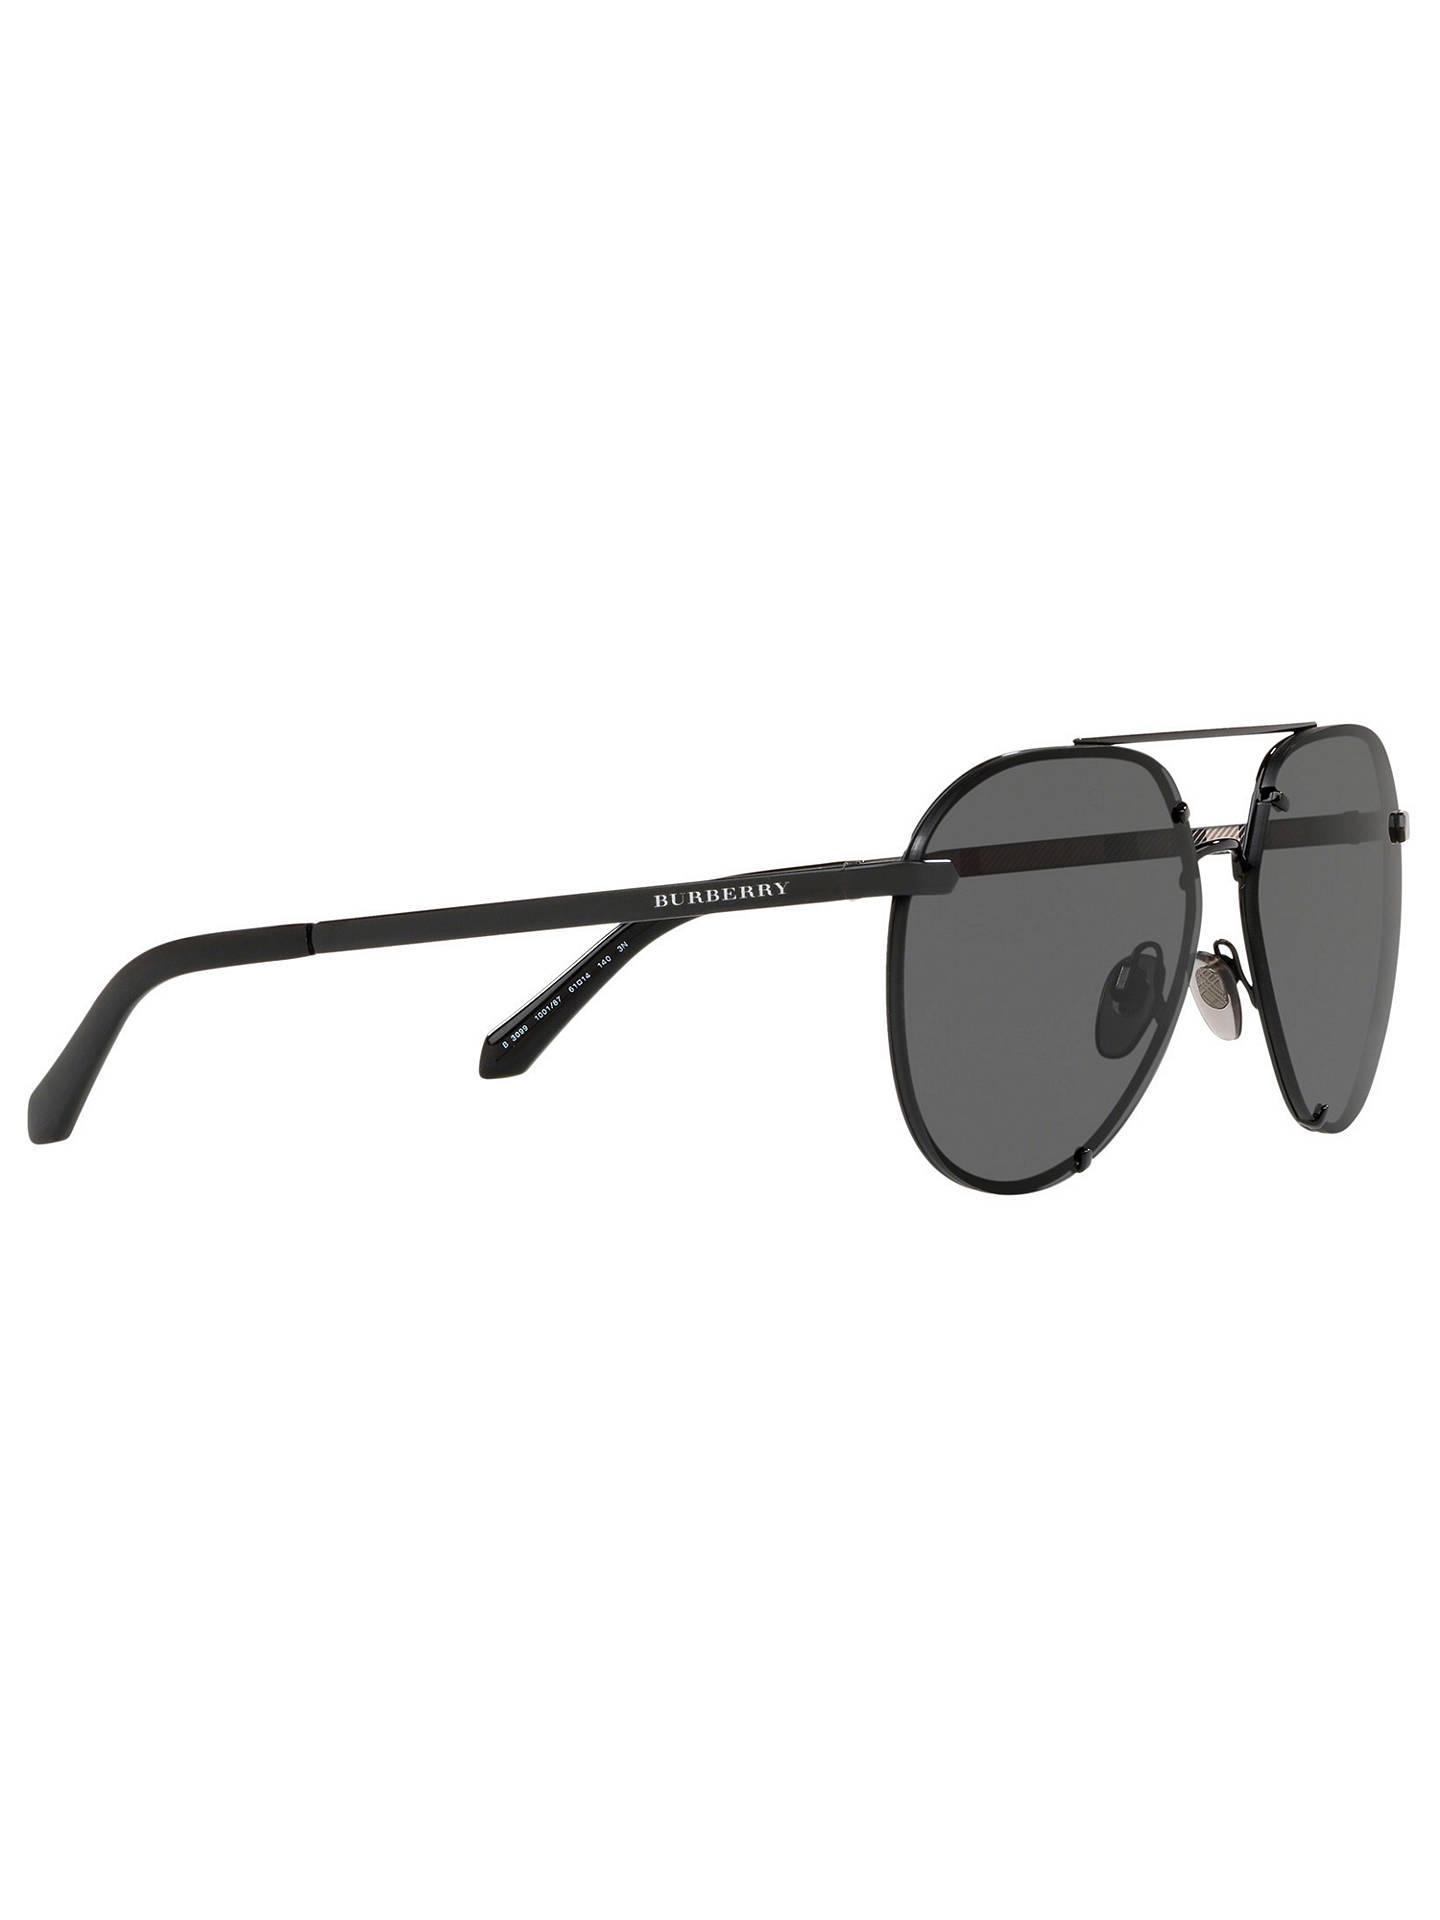 5a7401f3a ... Buy Burberry BE3099 Women's Aviator Sunglasses, Black Online at  johnlewis.com